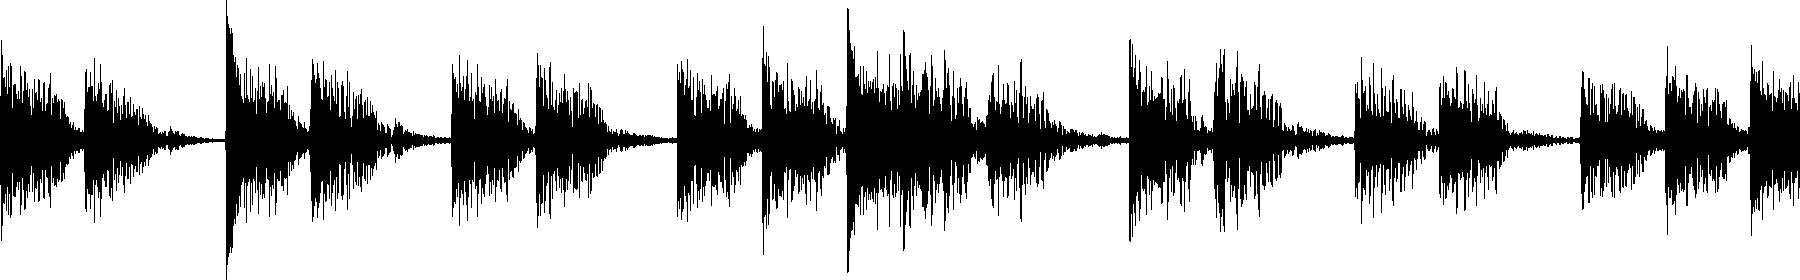 vedh melodyloop 001 em7 am7 bm 126bpm